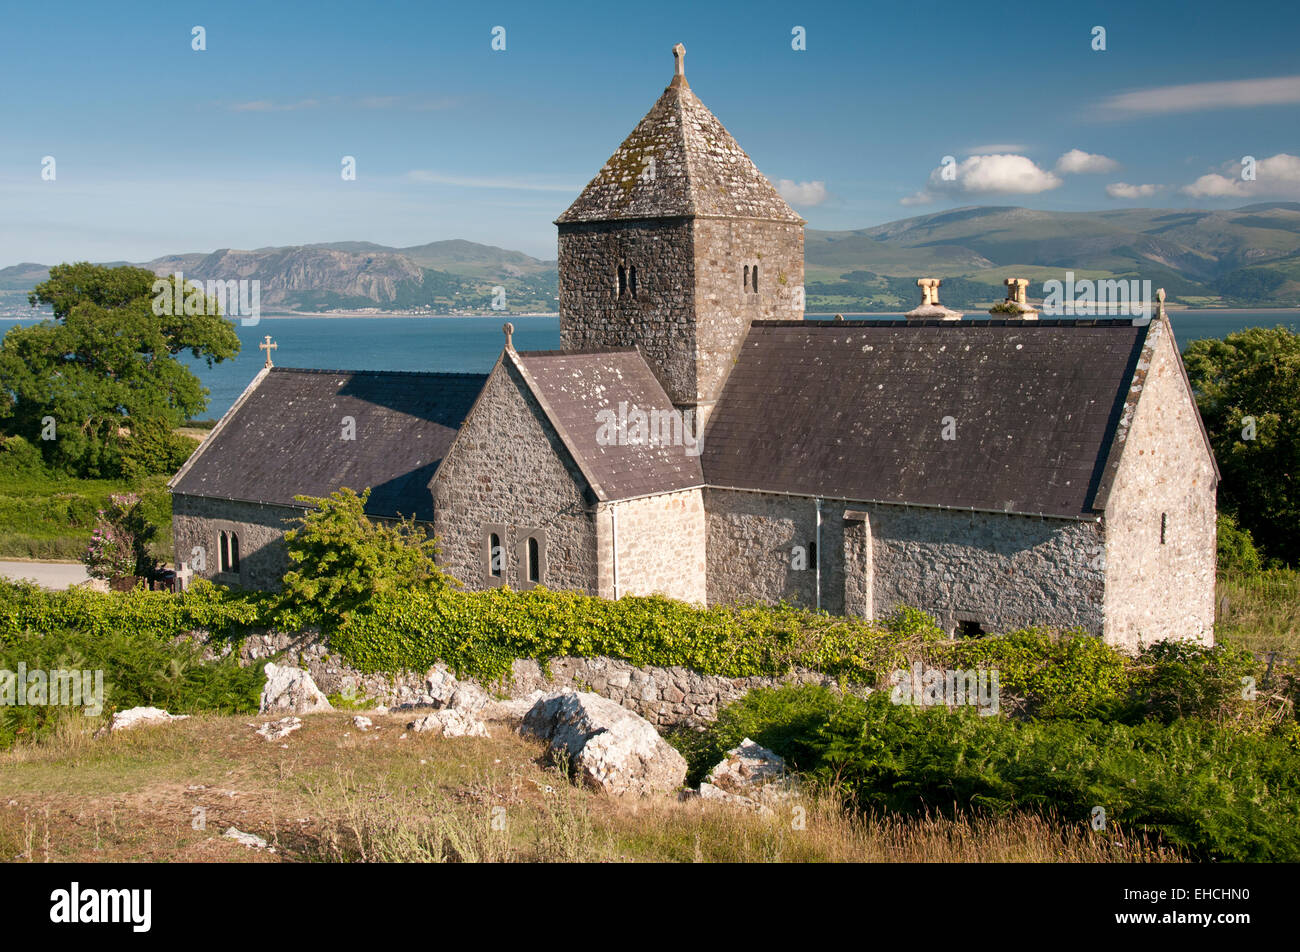 Penmon Priory and the Menai Straits, Near Beaumaris, Anglesey, North Wales, UK - Stock Image